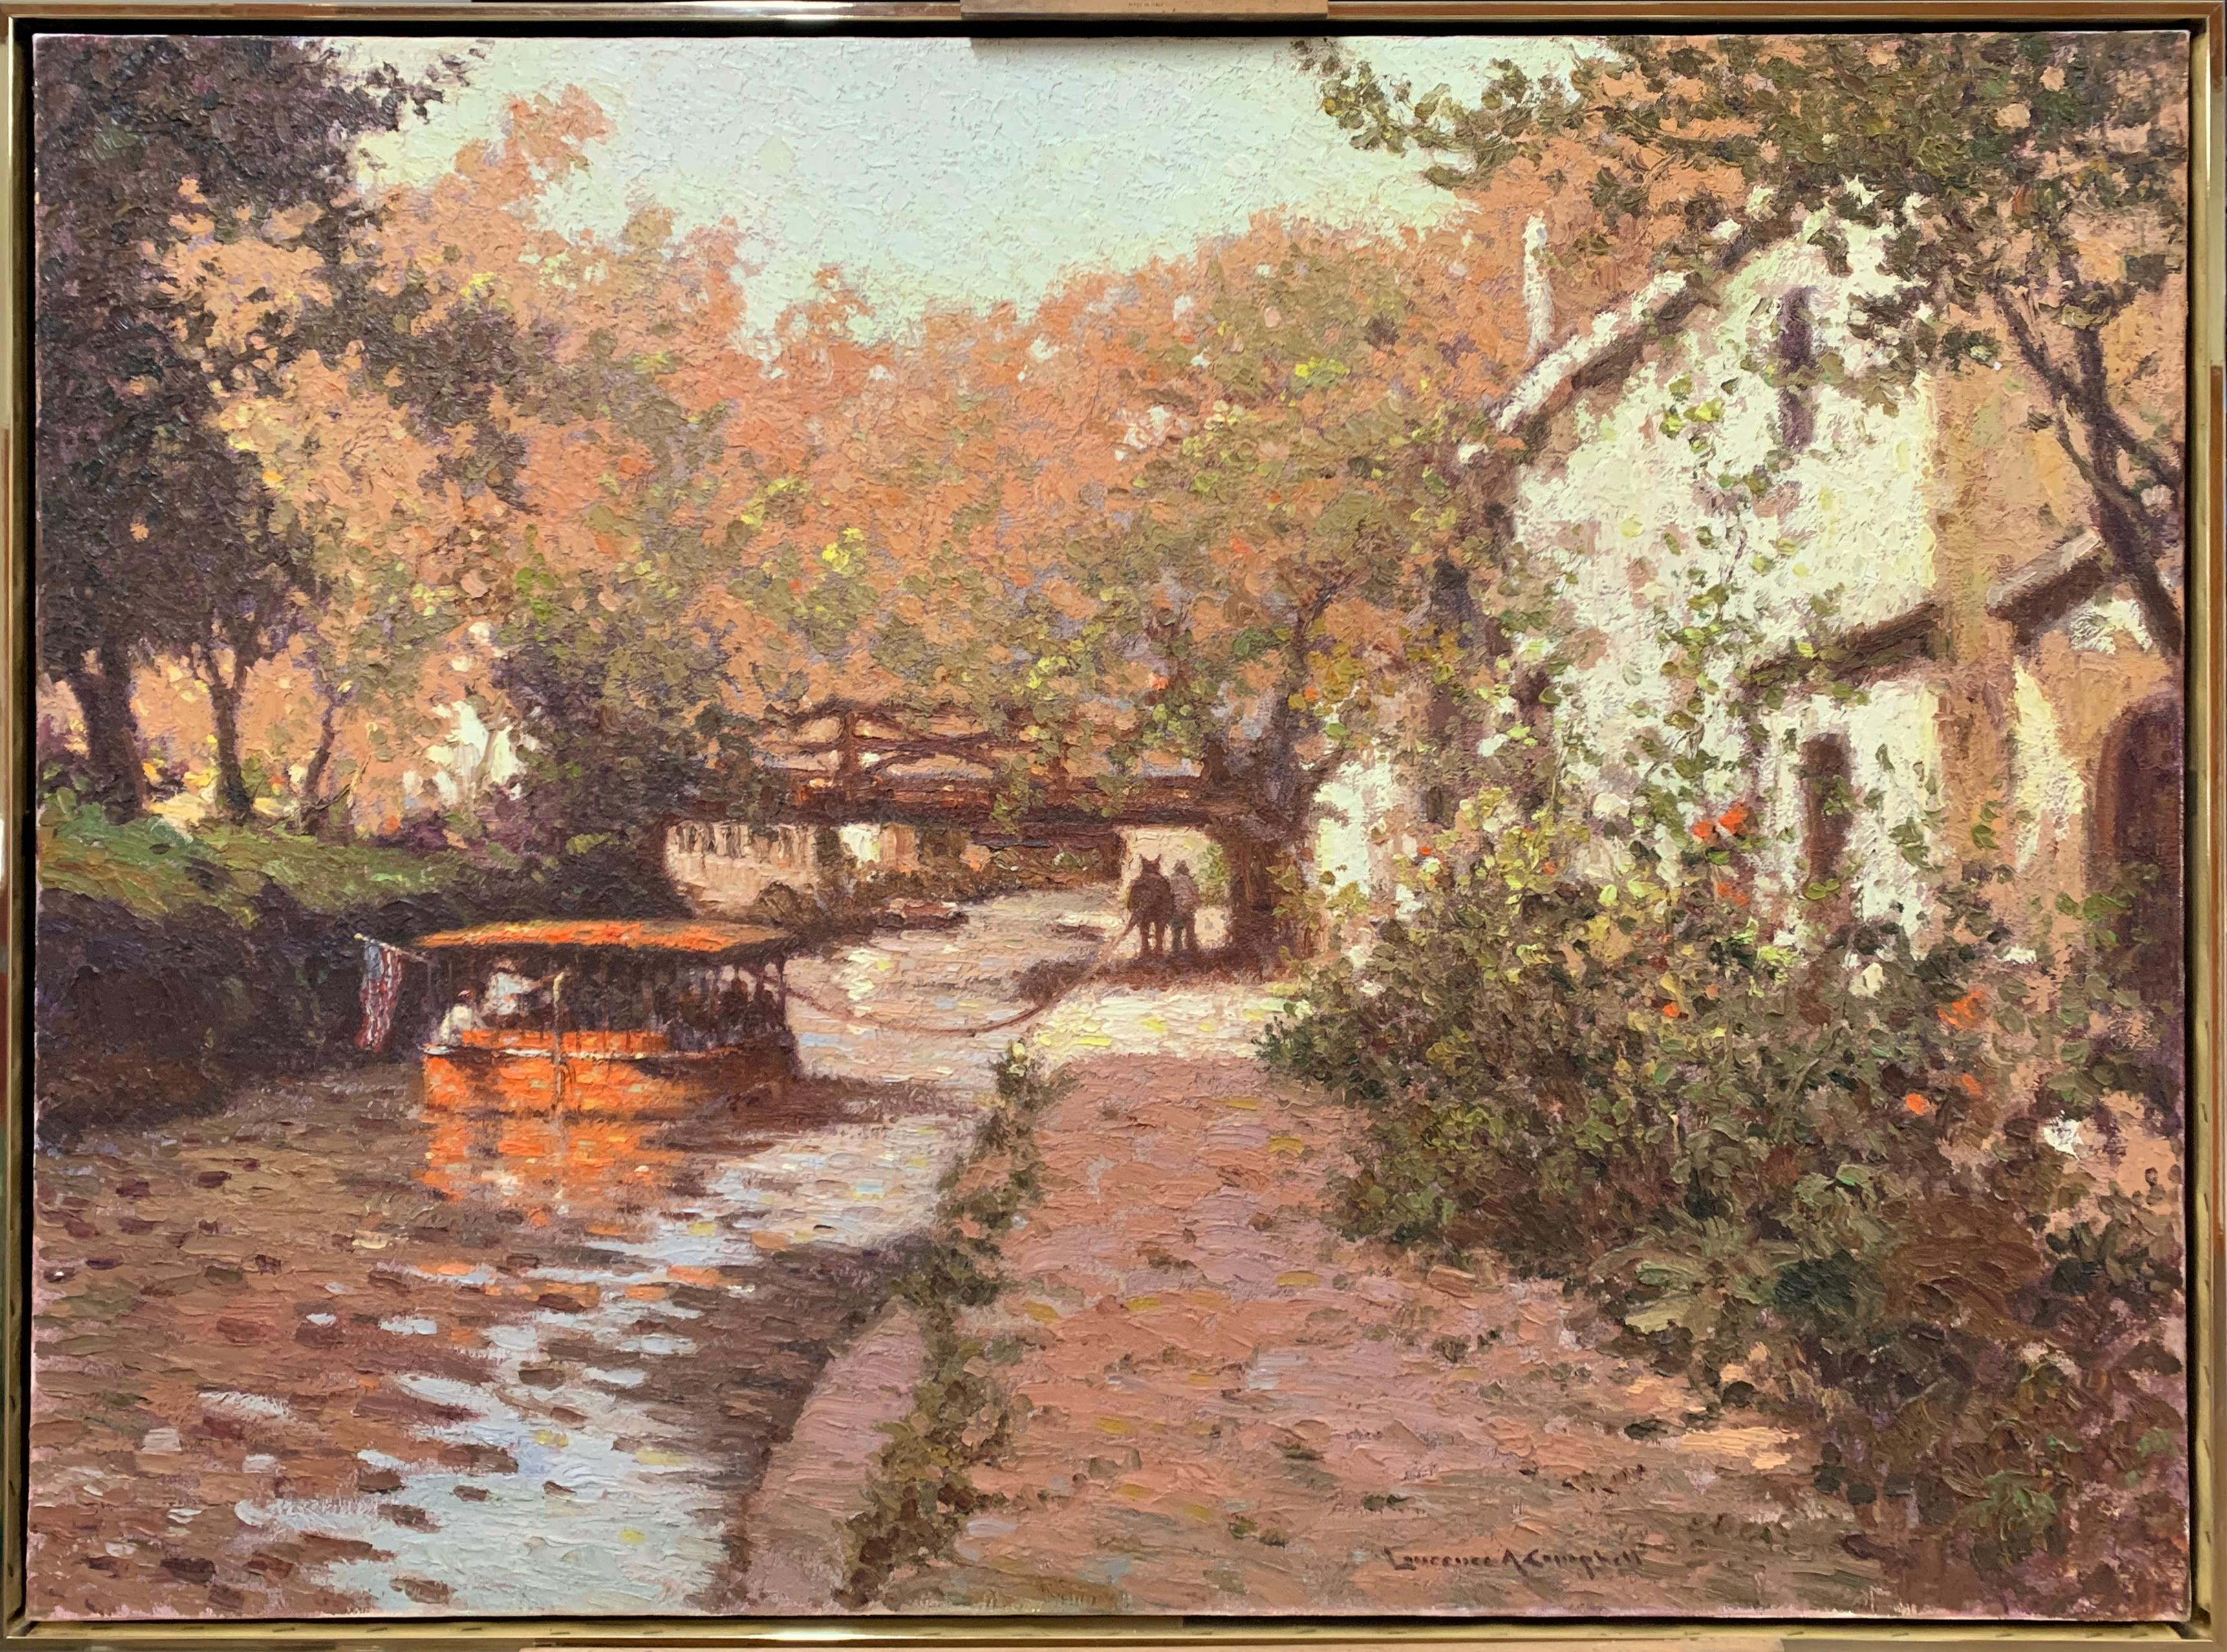 New Hope Canal, Bucks County, Pennsylvania Impressionist, Regional Landscape